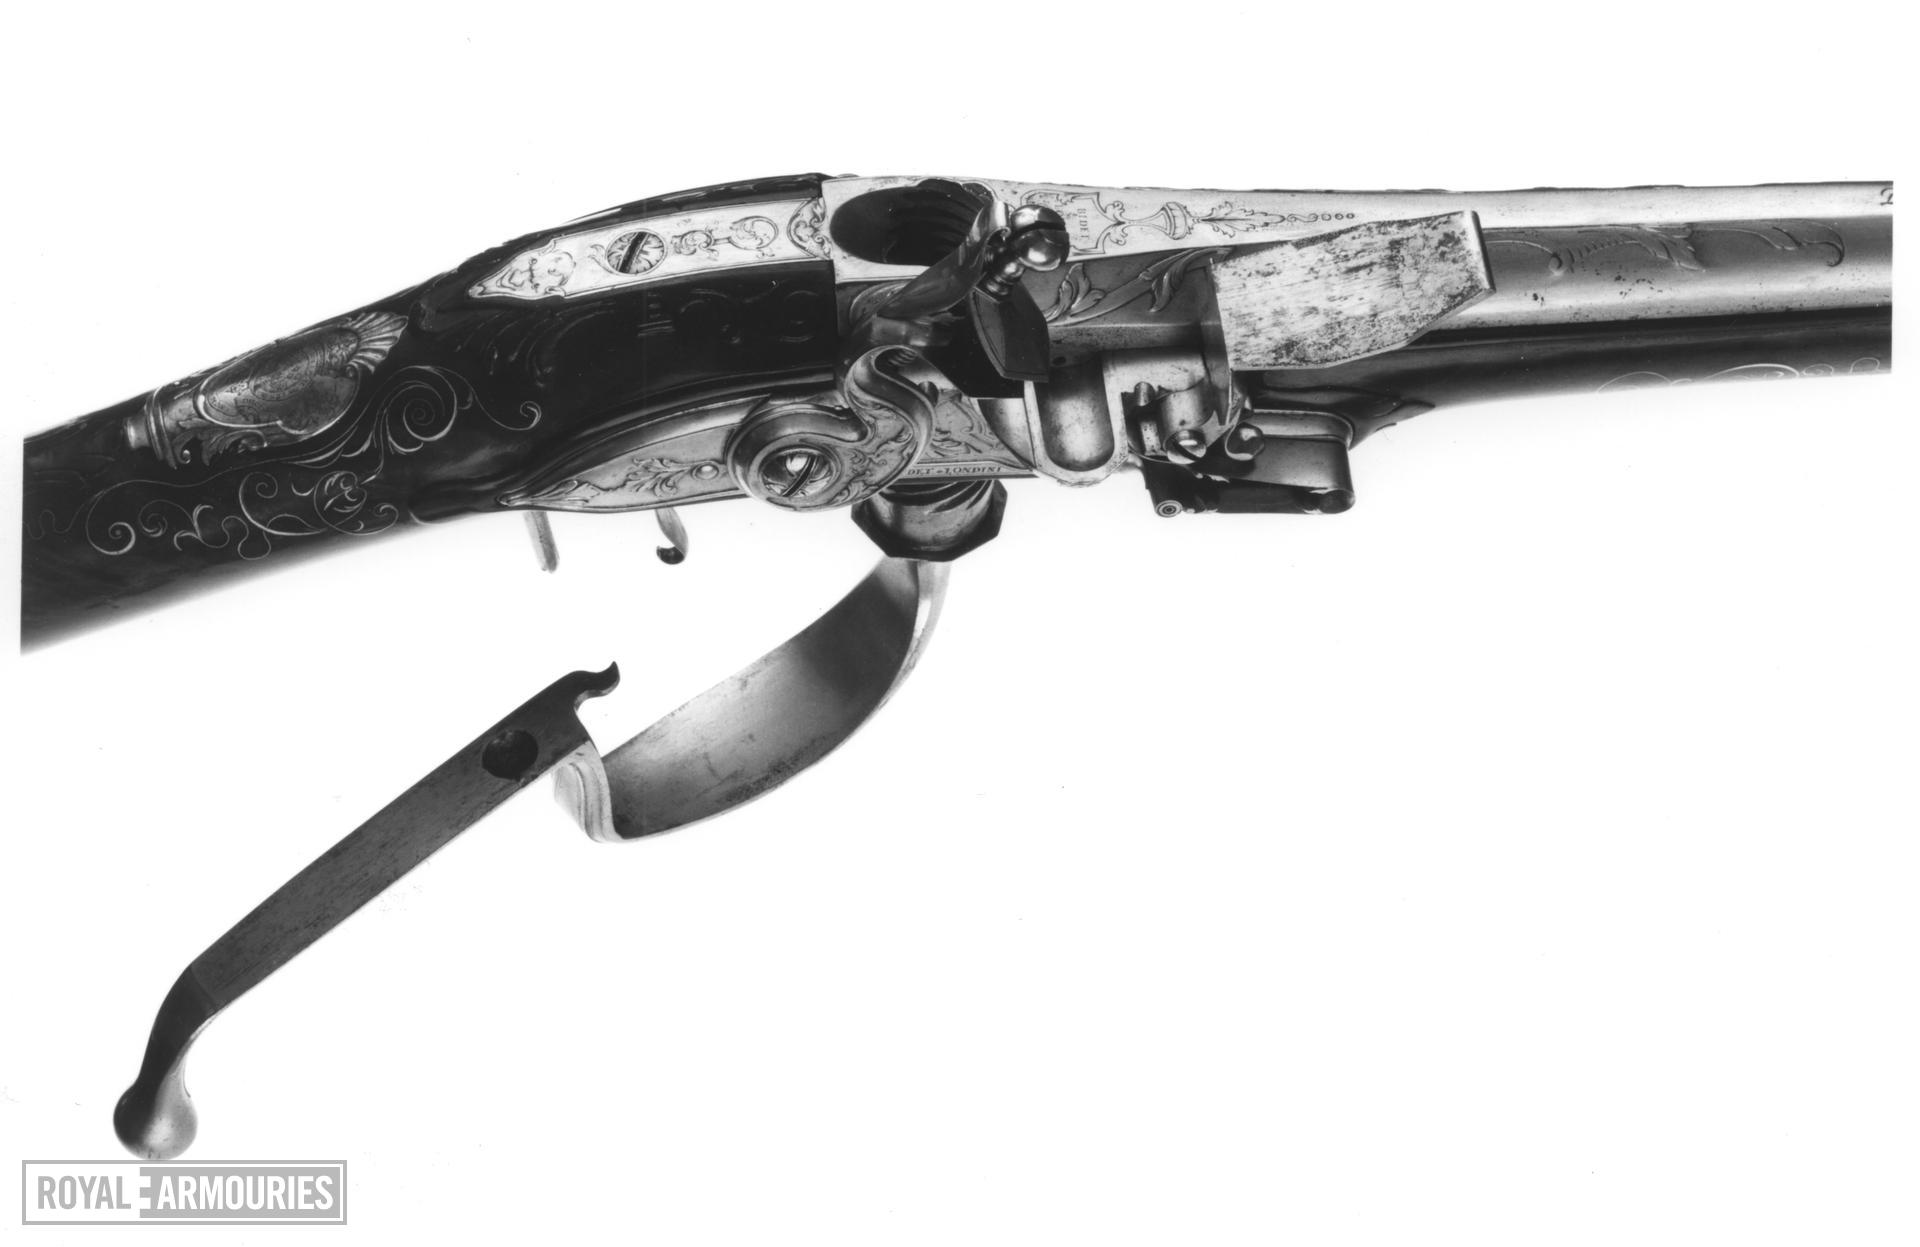 Flintlock breech-loading gun Sporting gun, possibly by Michael Bidet for George I or George II